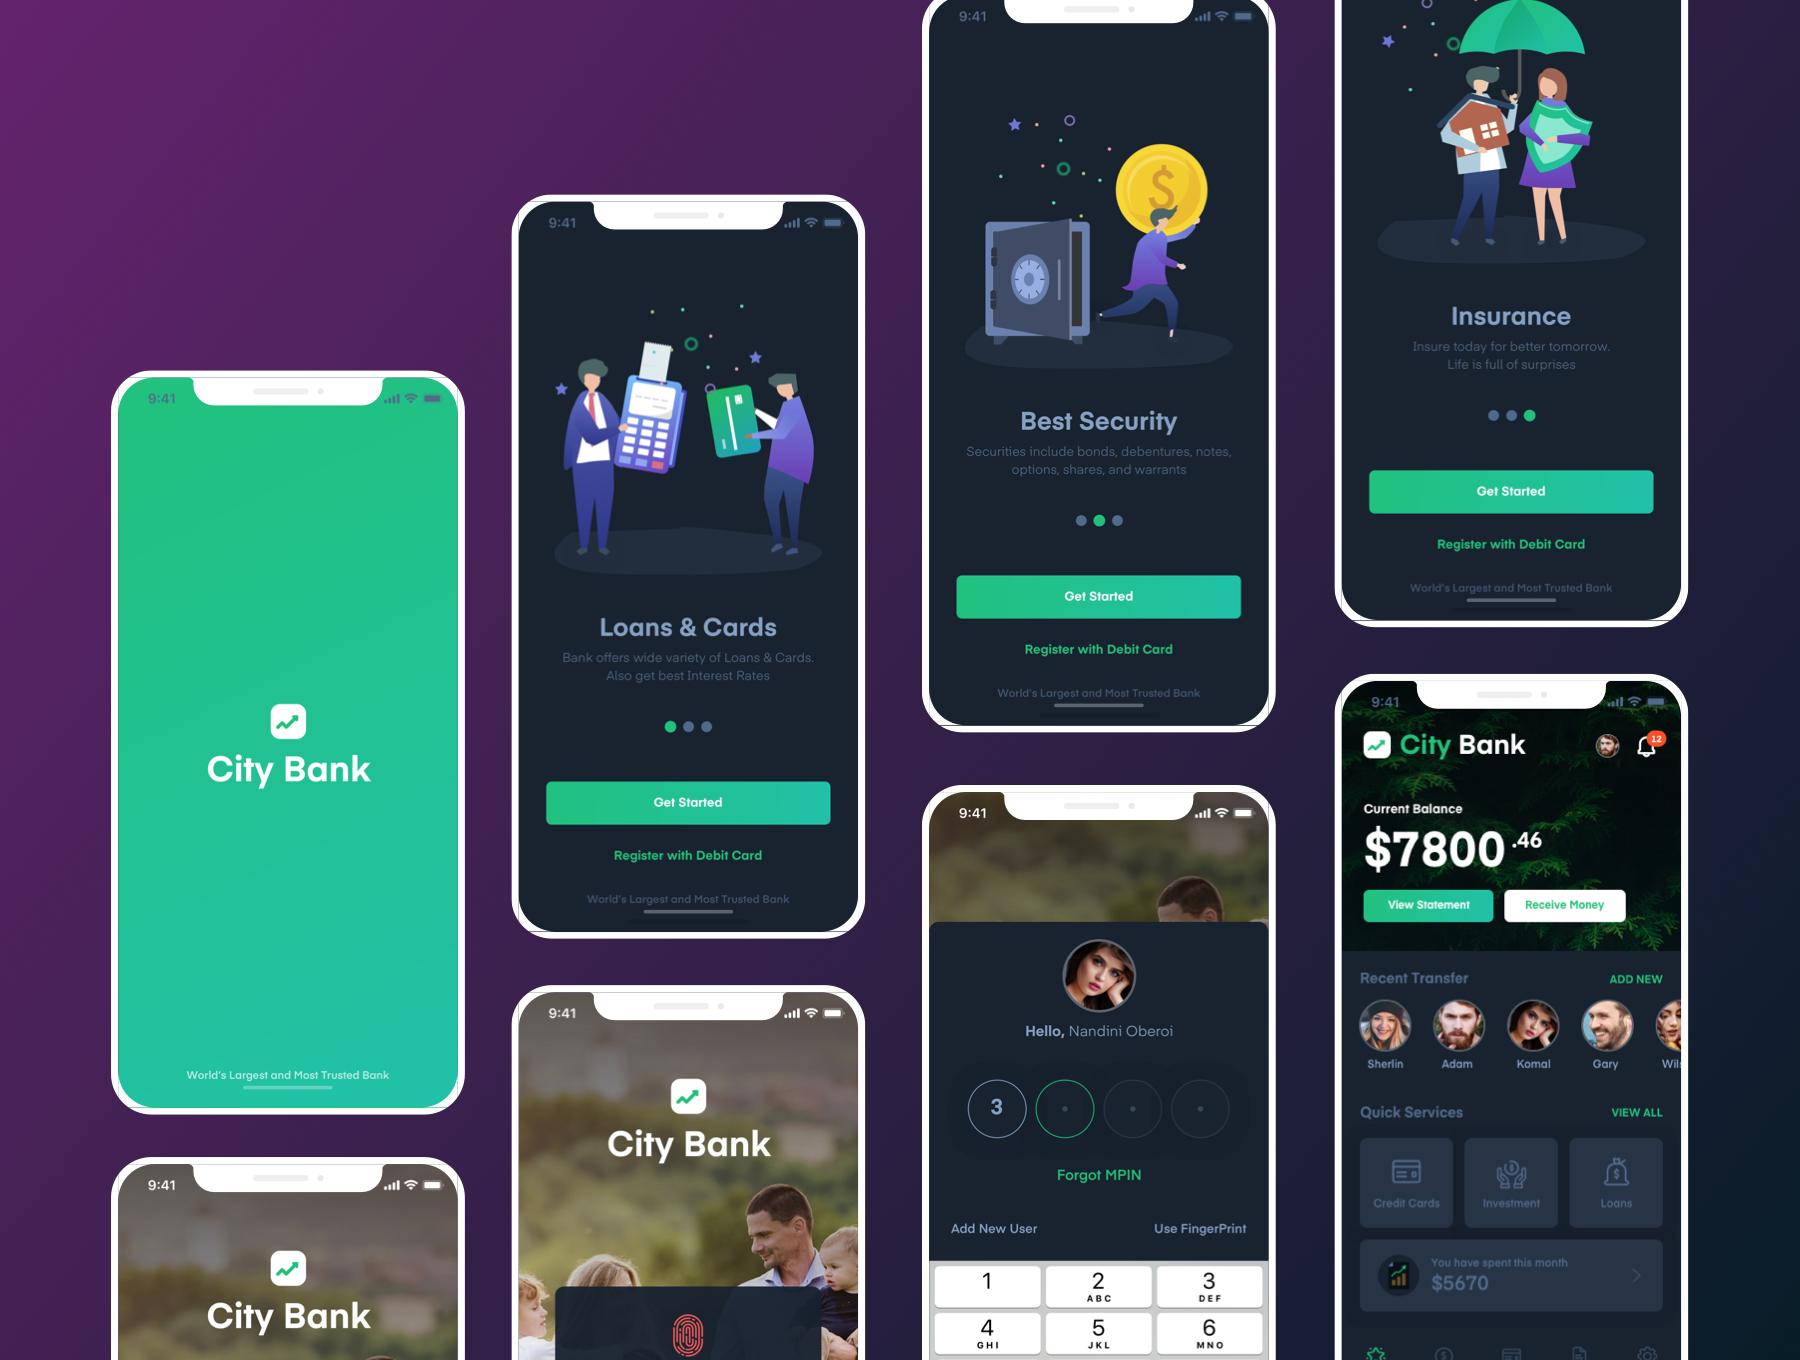 银行网页相关功能的金融 APP UI KIT 模板下载 [Sketch] City Bank Light and Dark App UI Kit